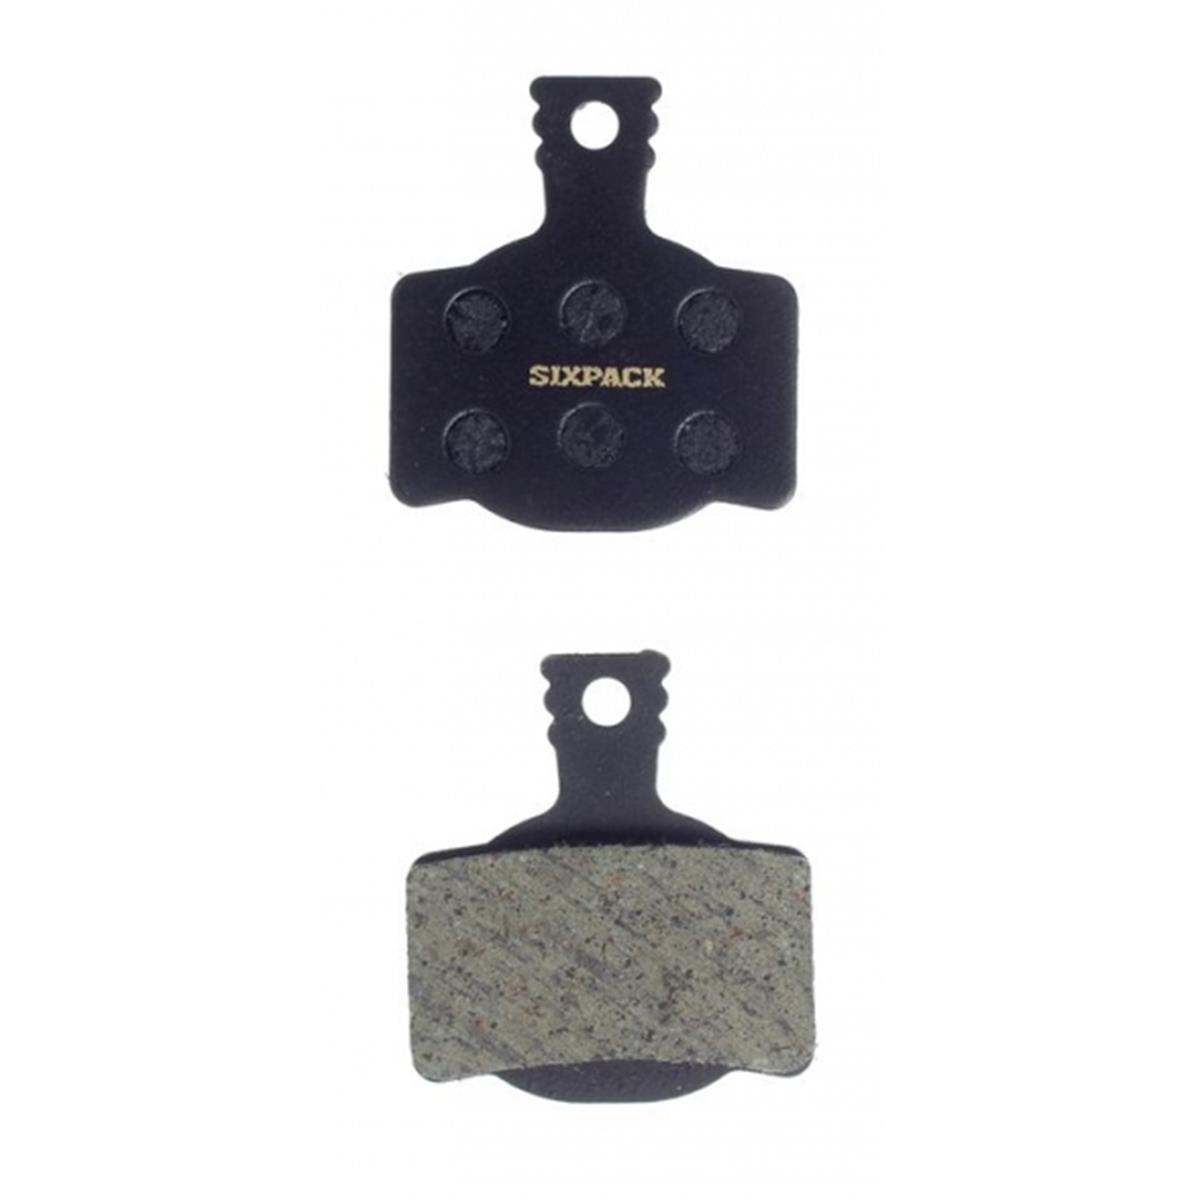 Sixpack Bike-Bremsbelag Magura Organisch für Magura MT8/MT6/MT4/MT2 (2-piston)